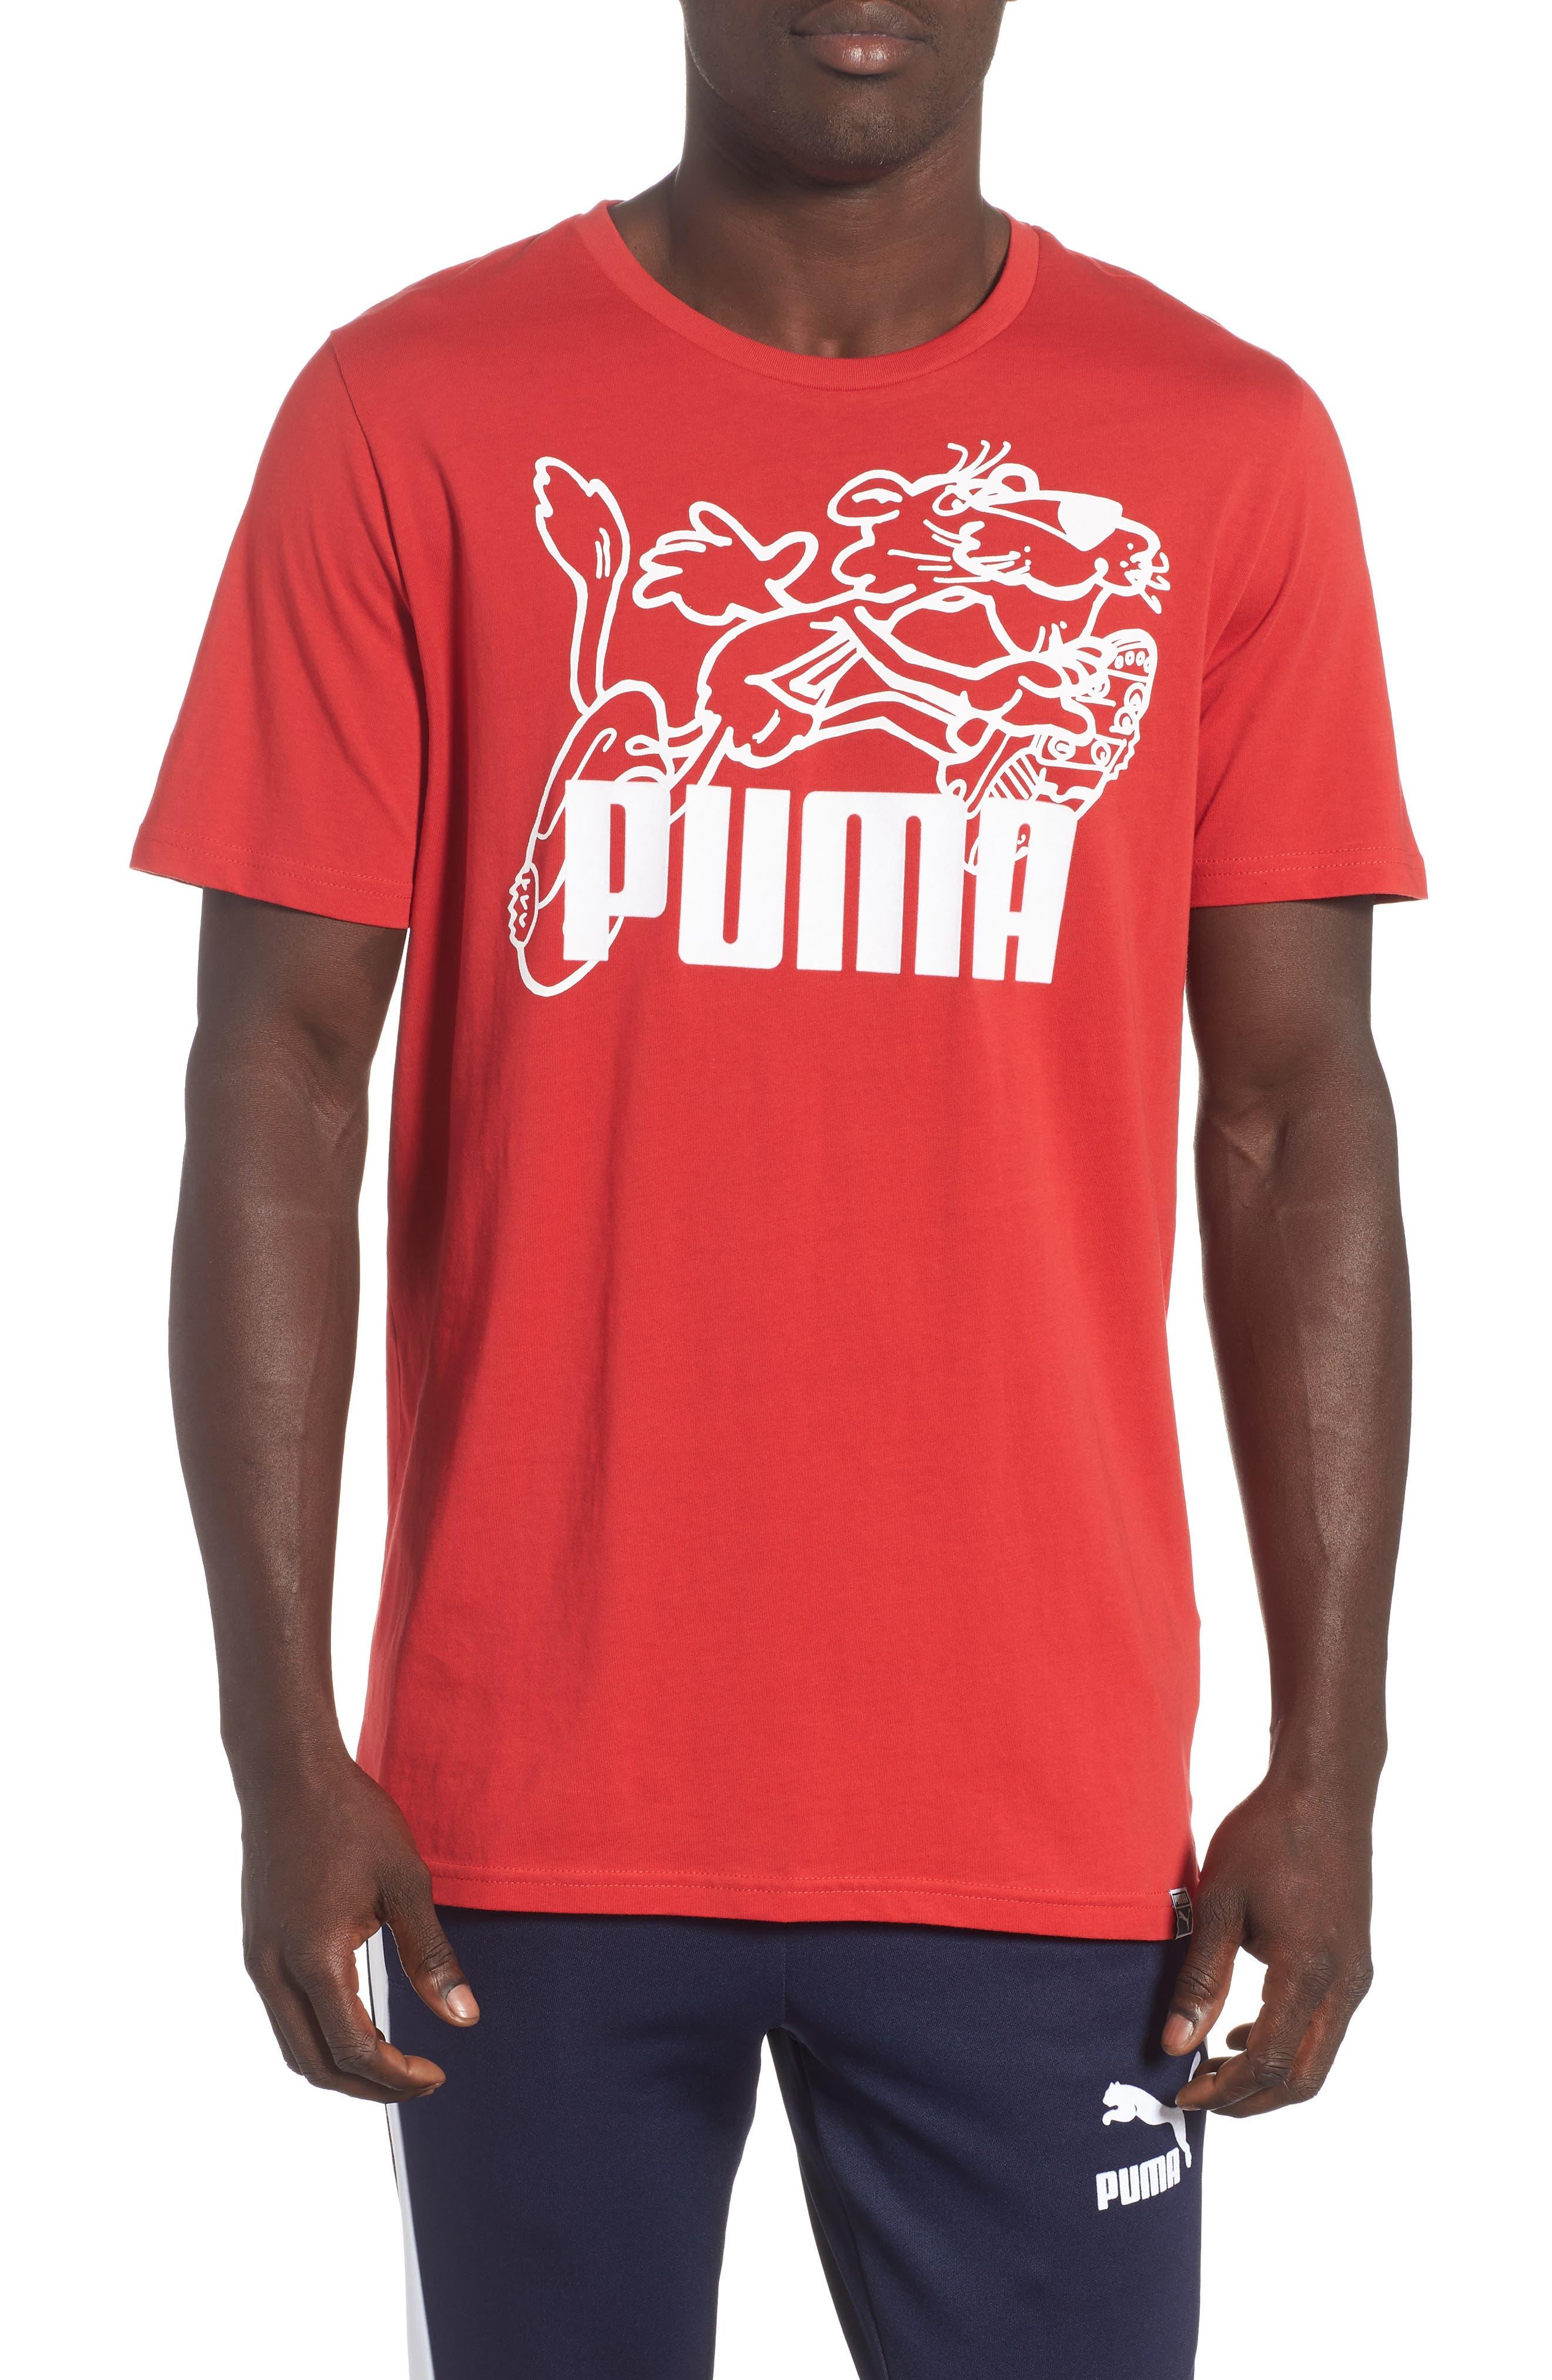 Puma Retro Sports T-Shirt, Red